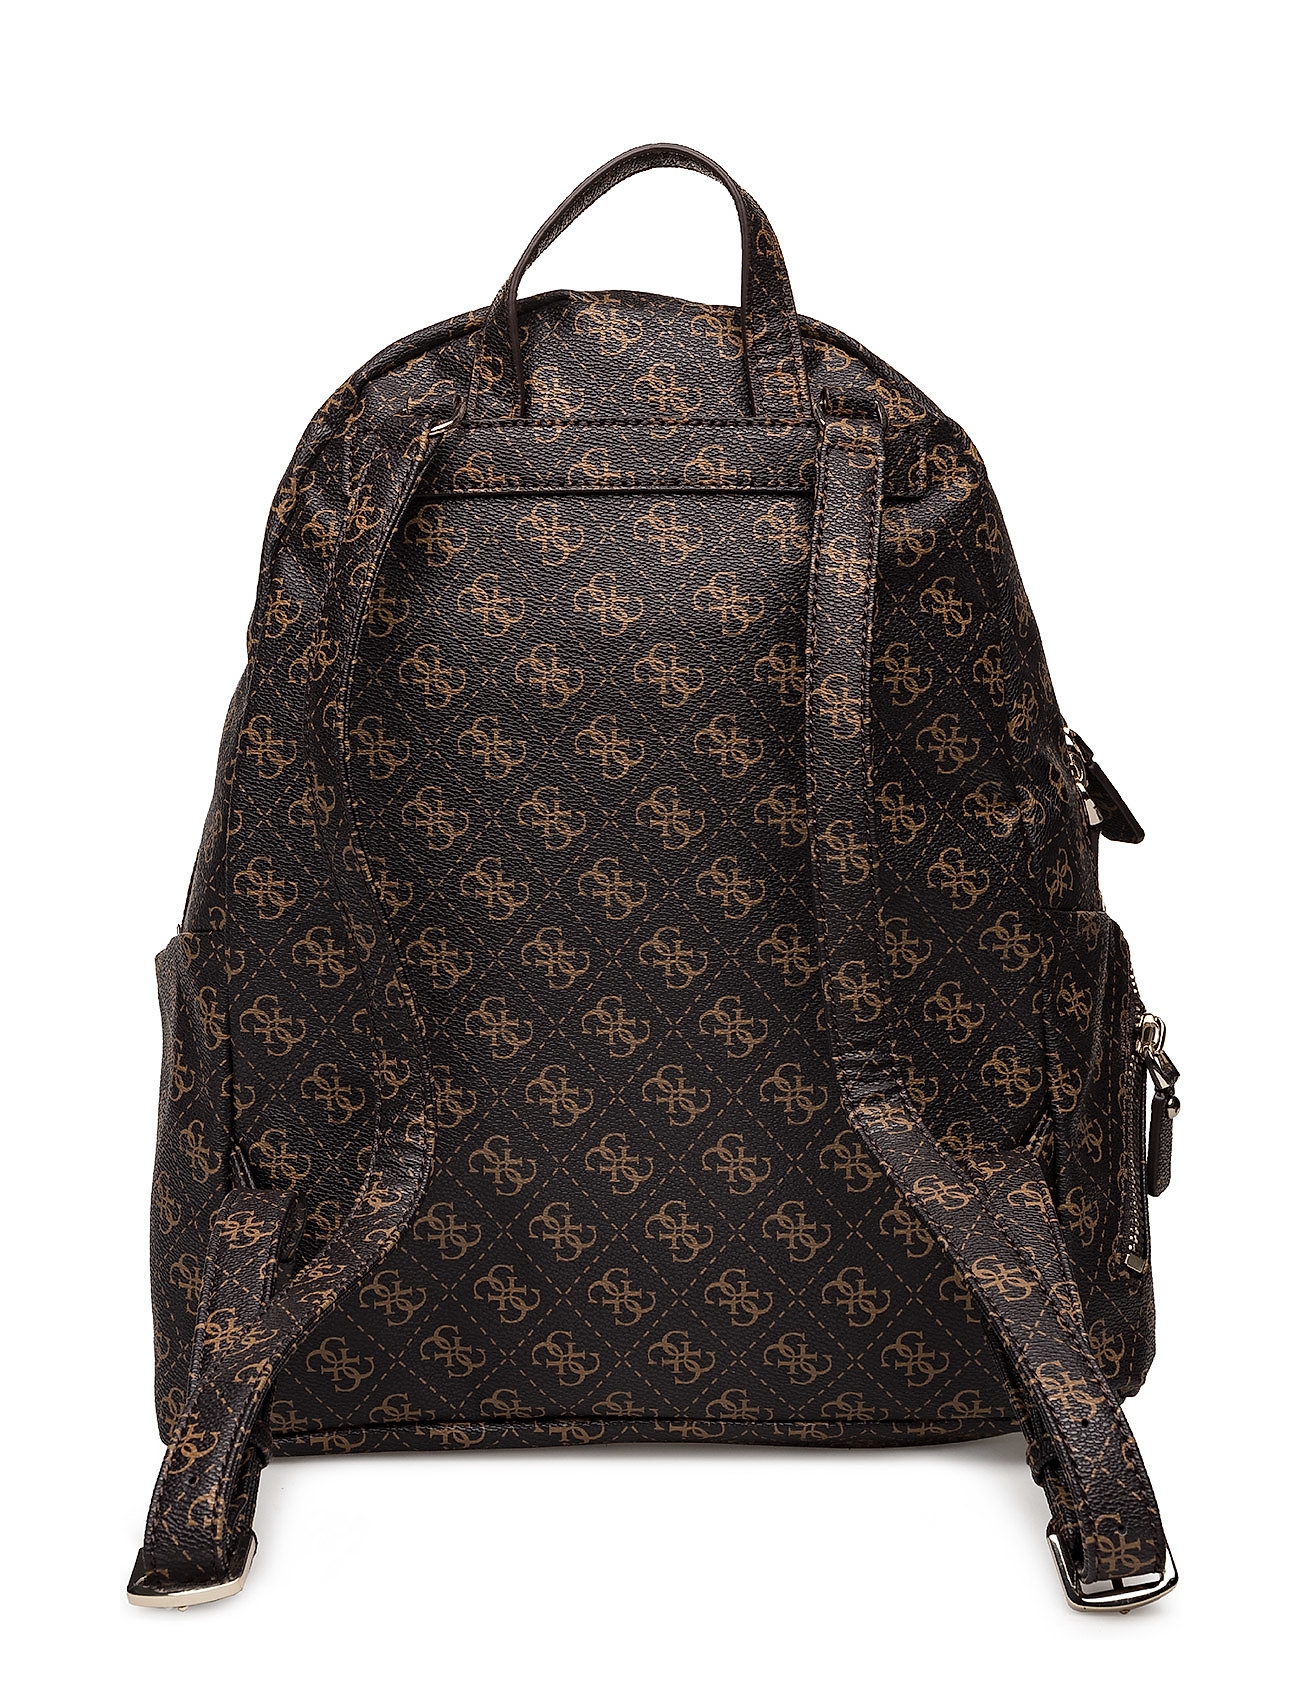 Leeza 25Sale Guess Rucksack Tasche Braun Backpack D92IWEYH